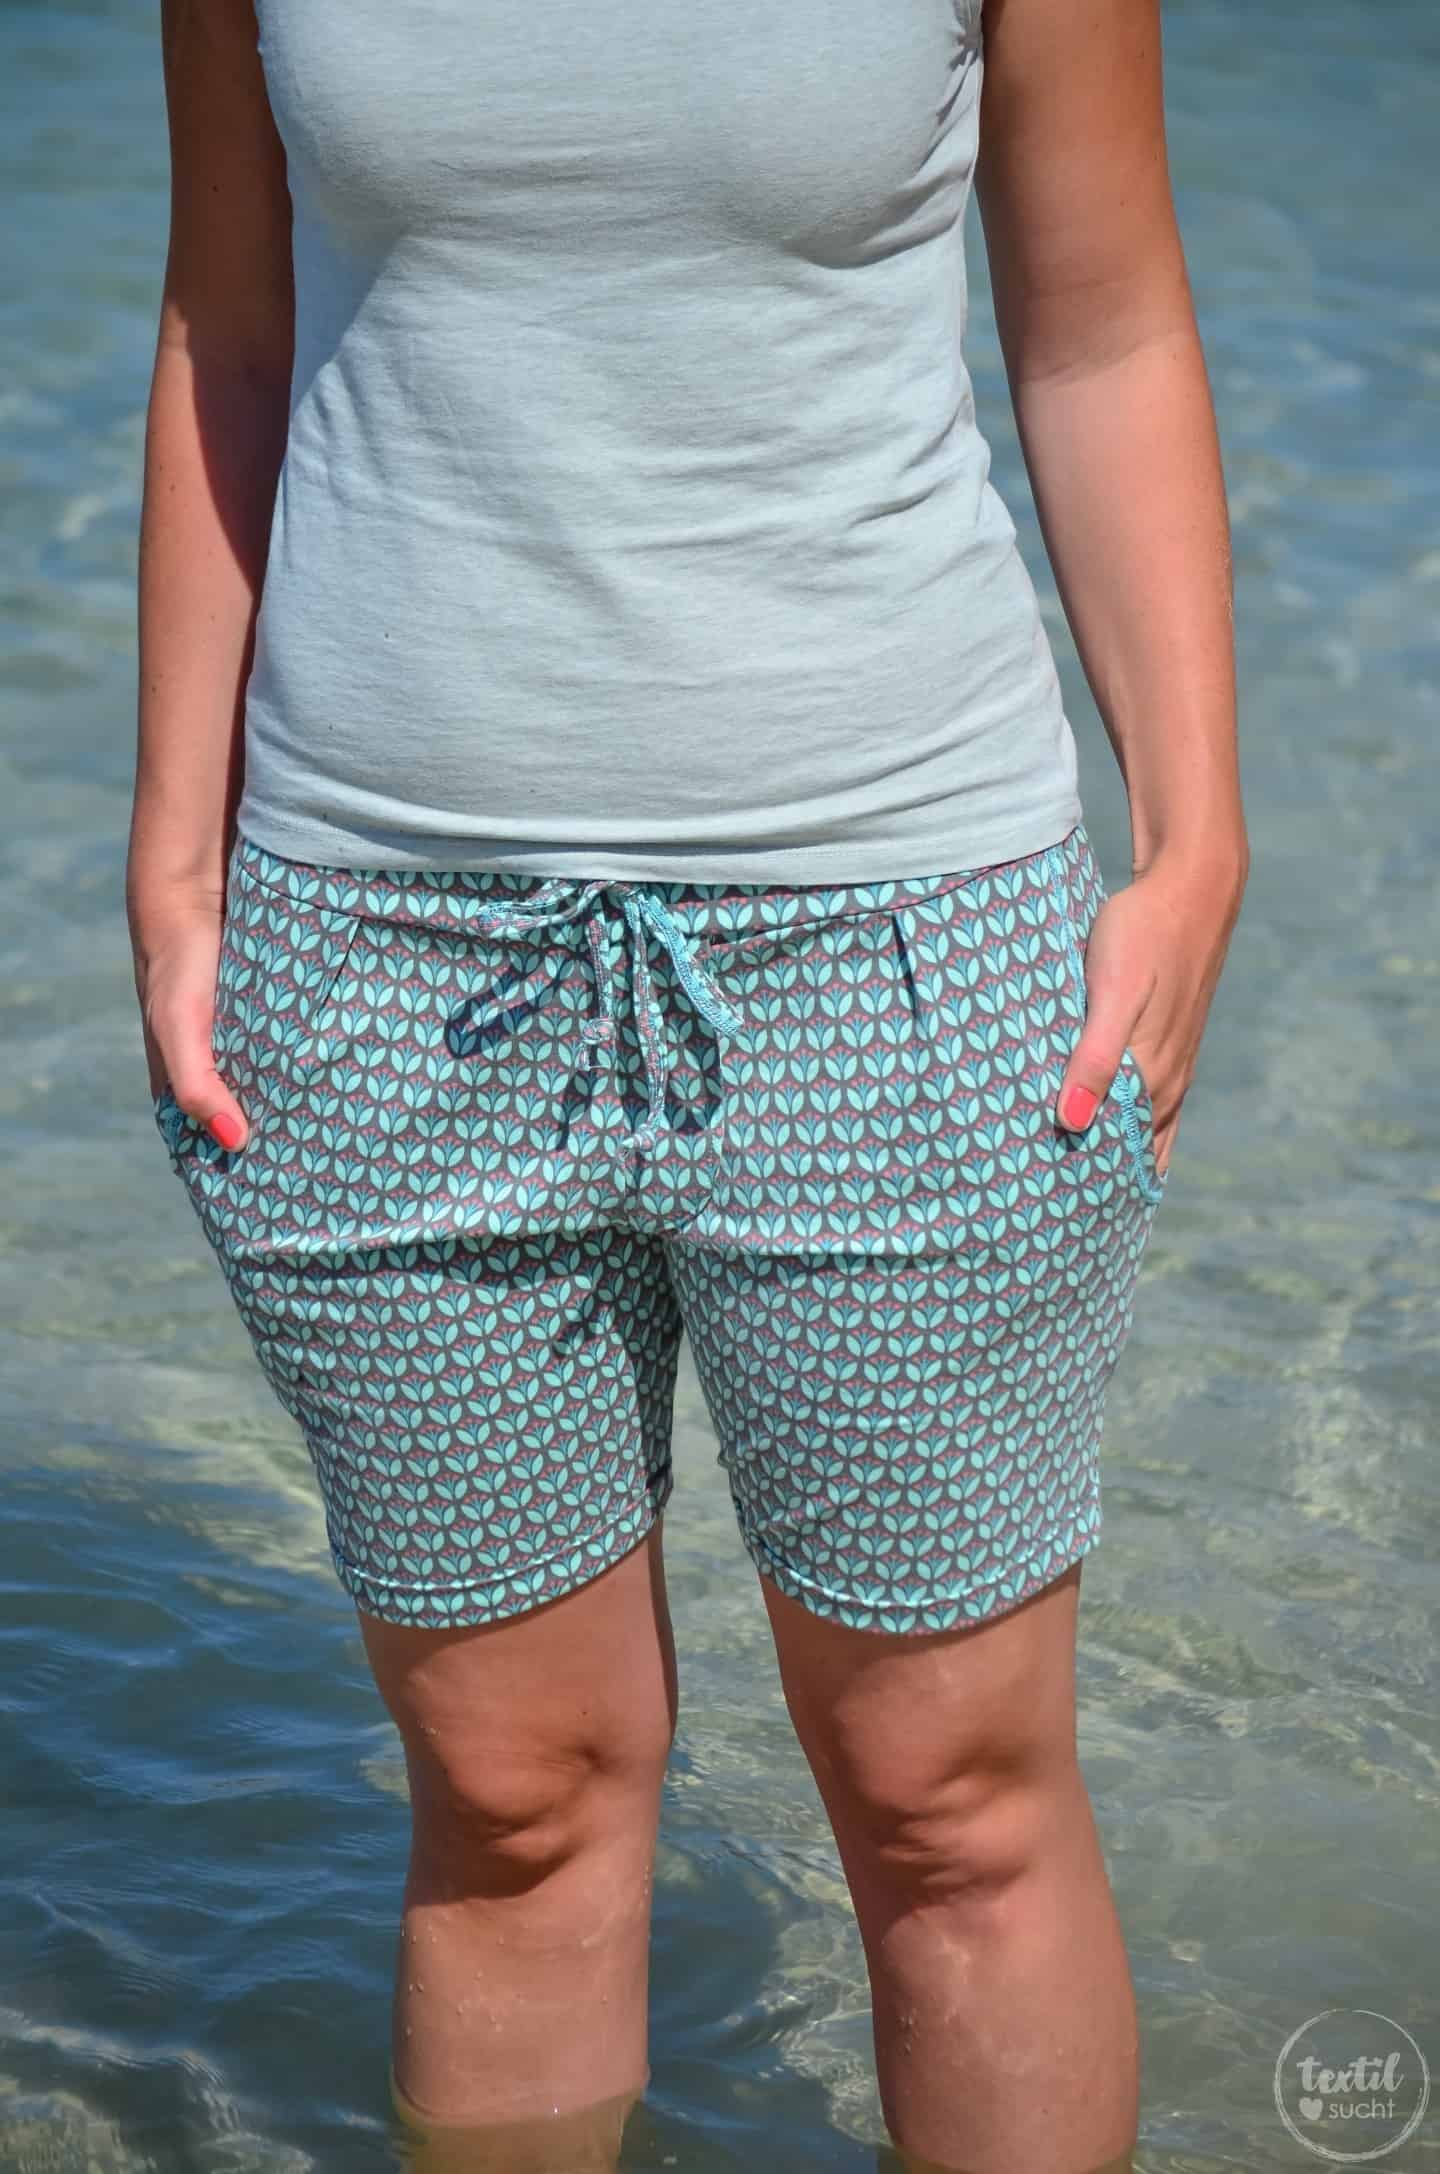 Nähen für den Strand: Schnittmuster Velara als Shorts - Bild 8 | textilsucht.de